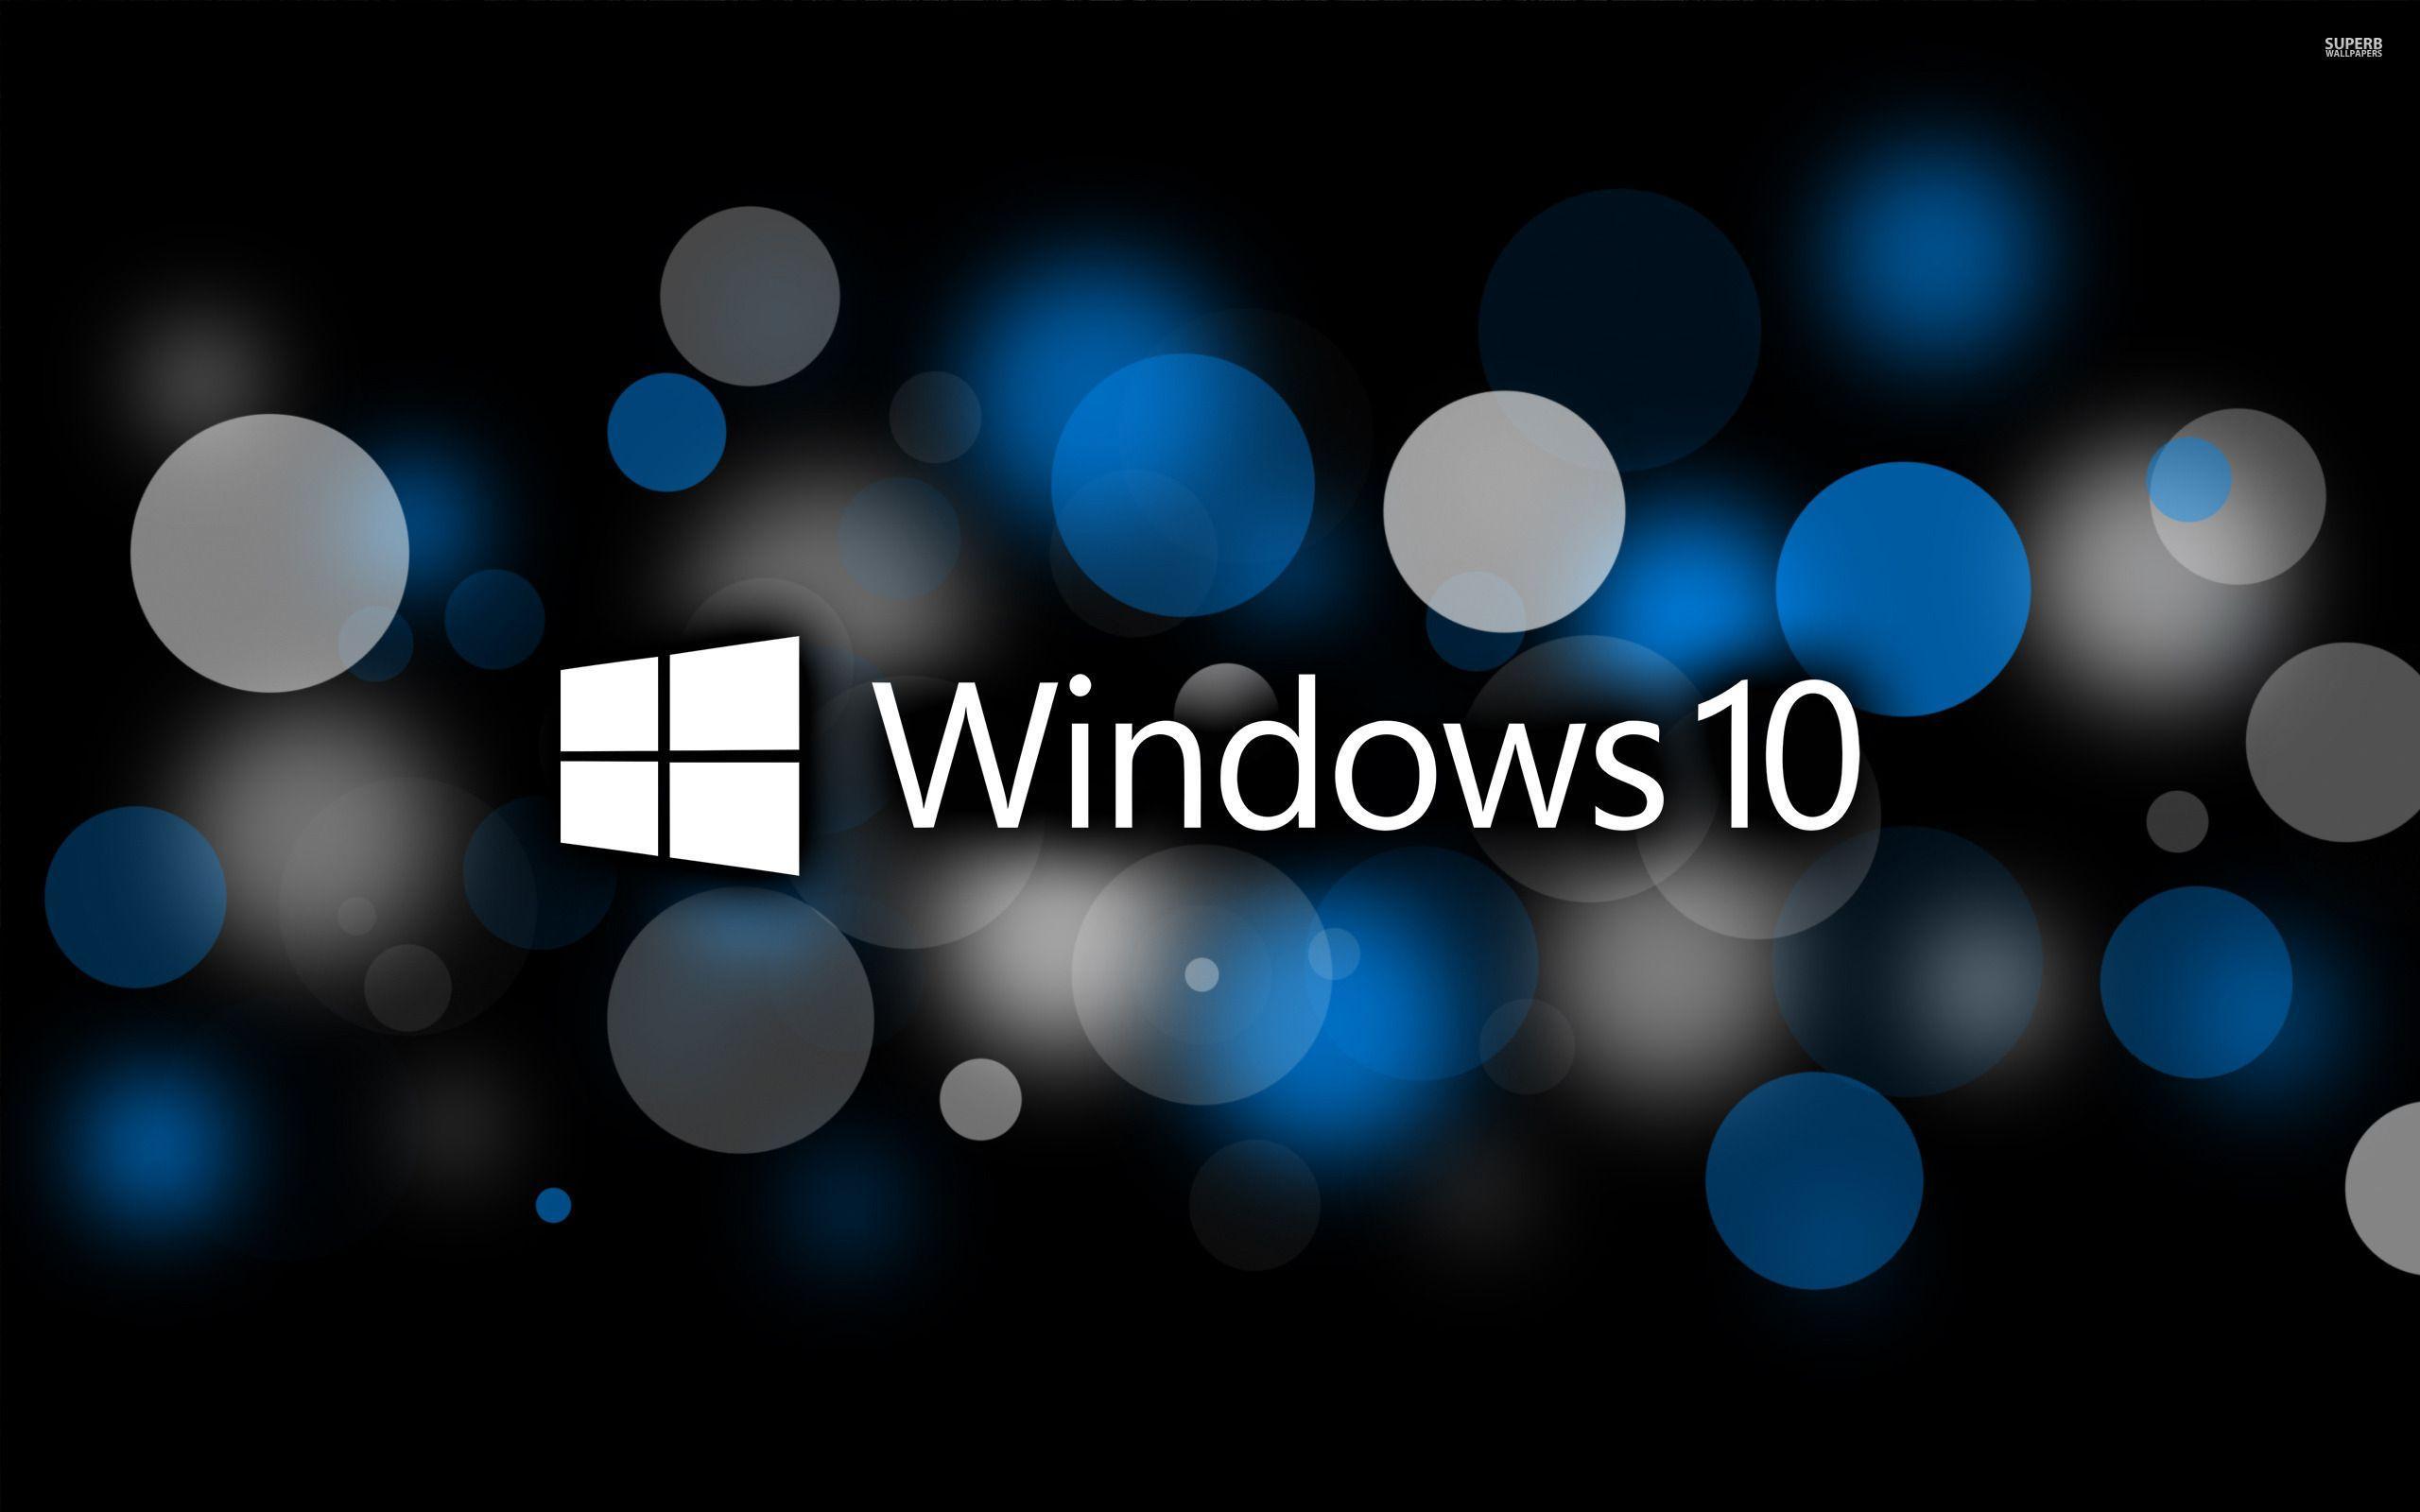 Wallpaper For Laptop Hd Windows 10